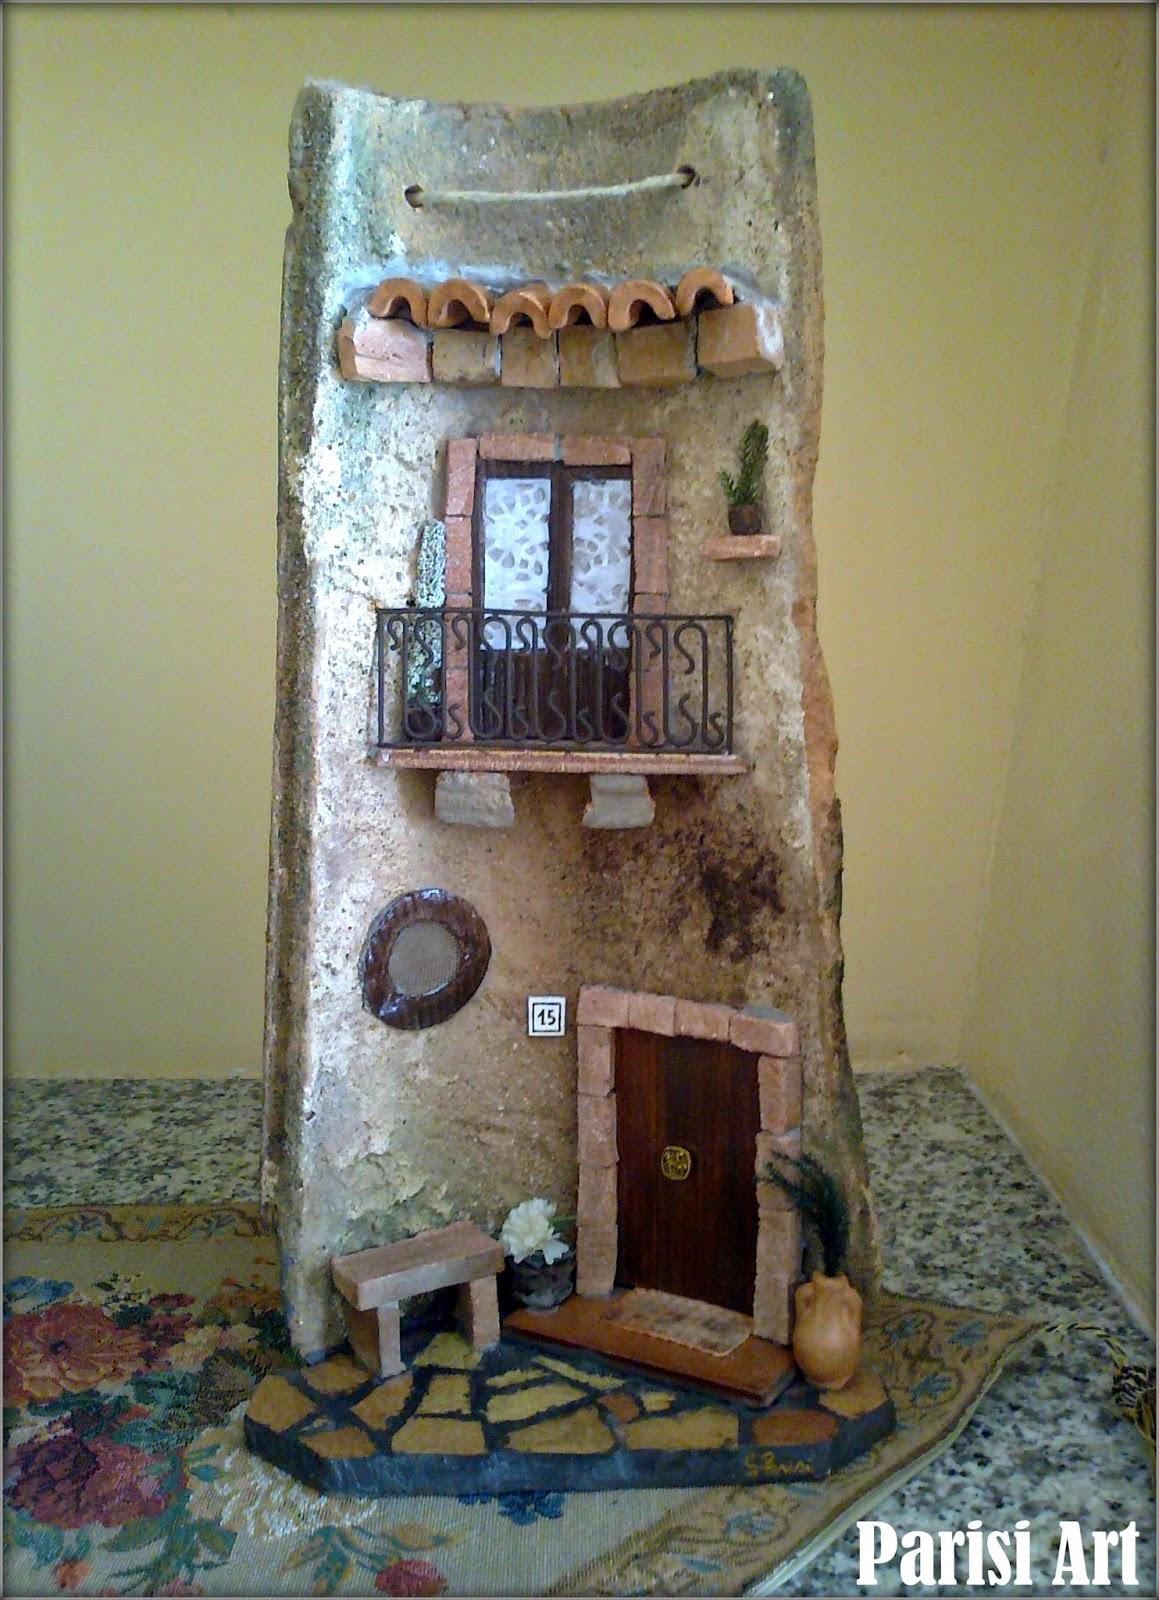 Parisi art tegole grandi - Tegole decorate ...